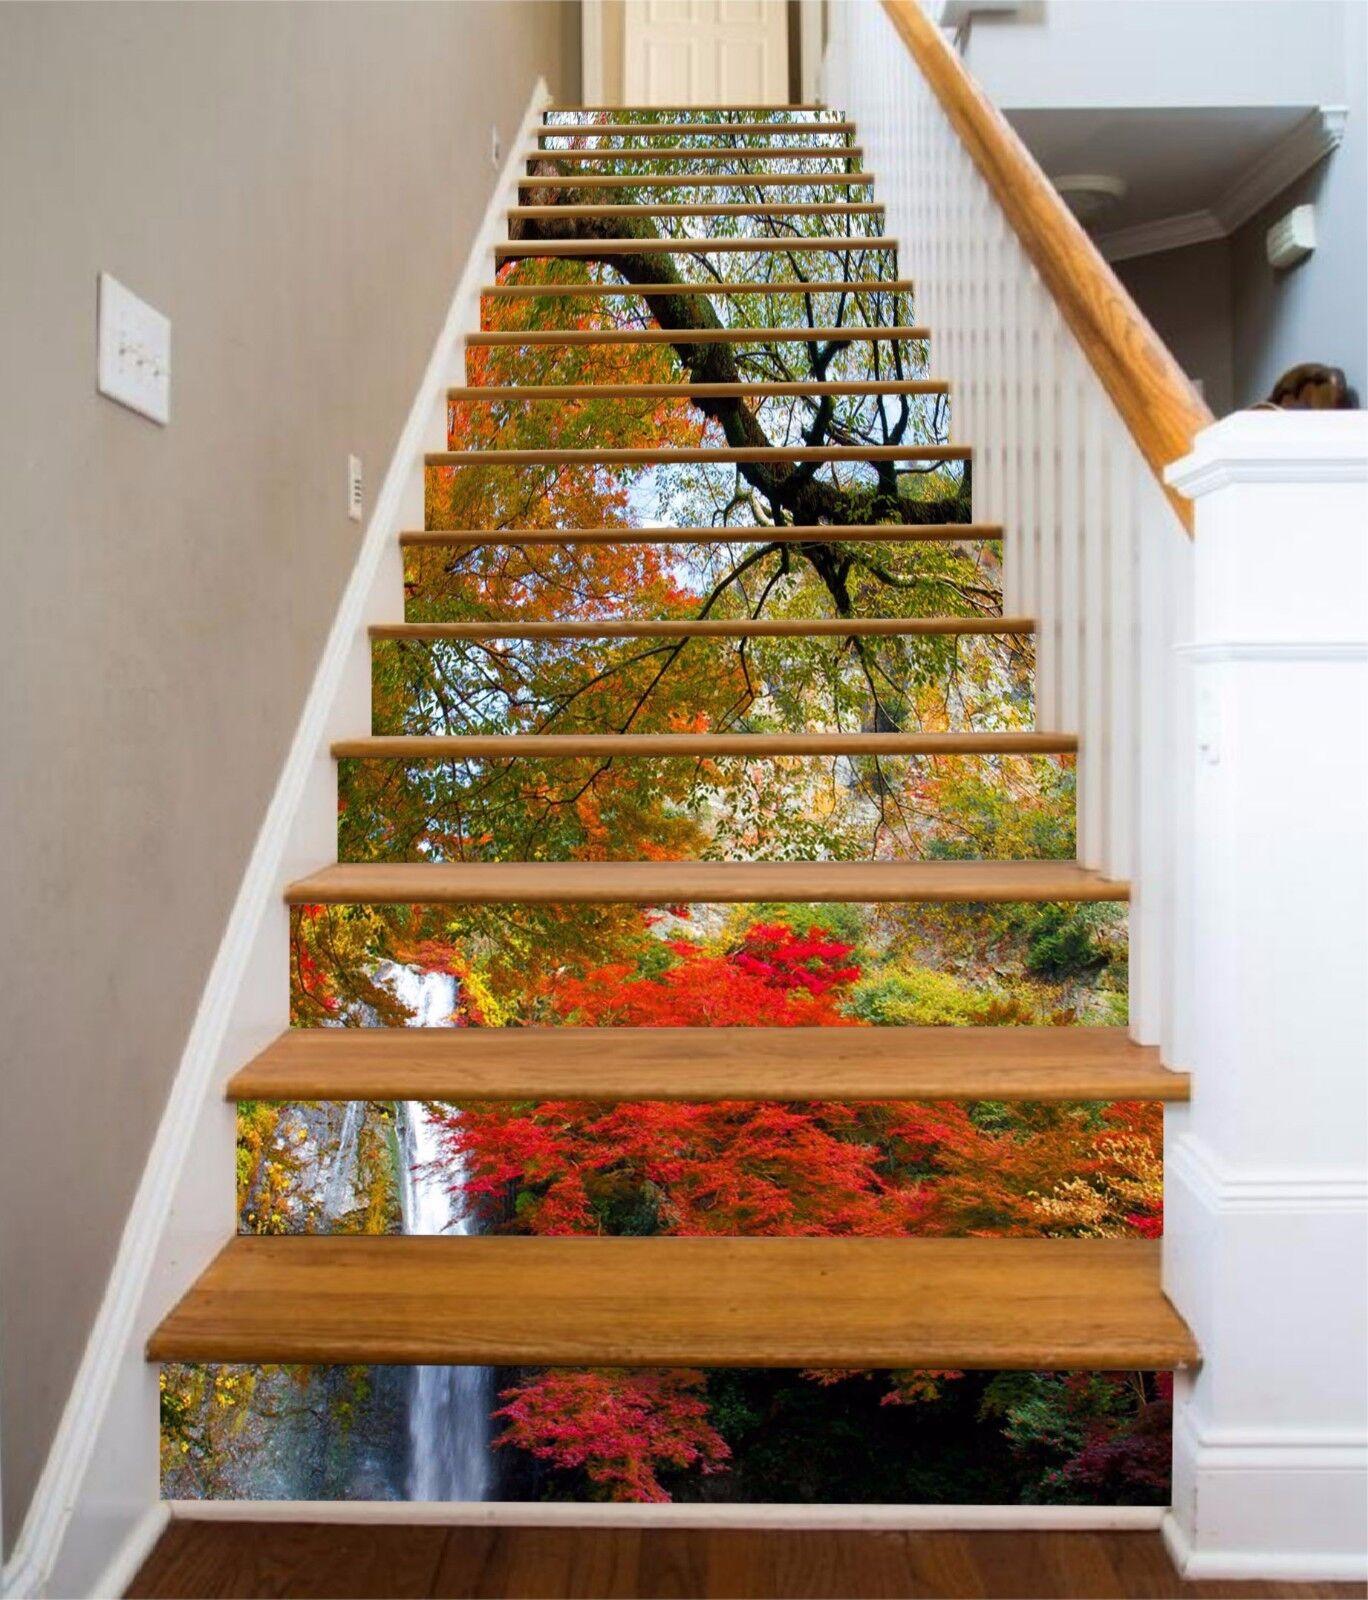 3D Autumn Scene 806 Stair Risers Decoration Photo Mural Vinyl Decal Wallpaper AU